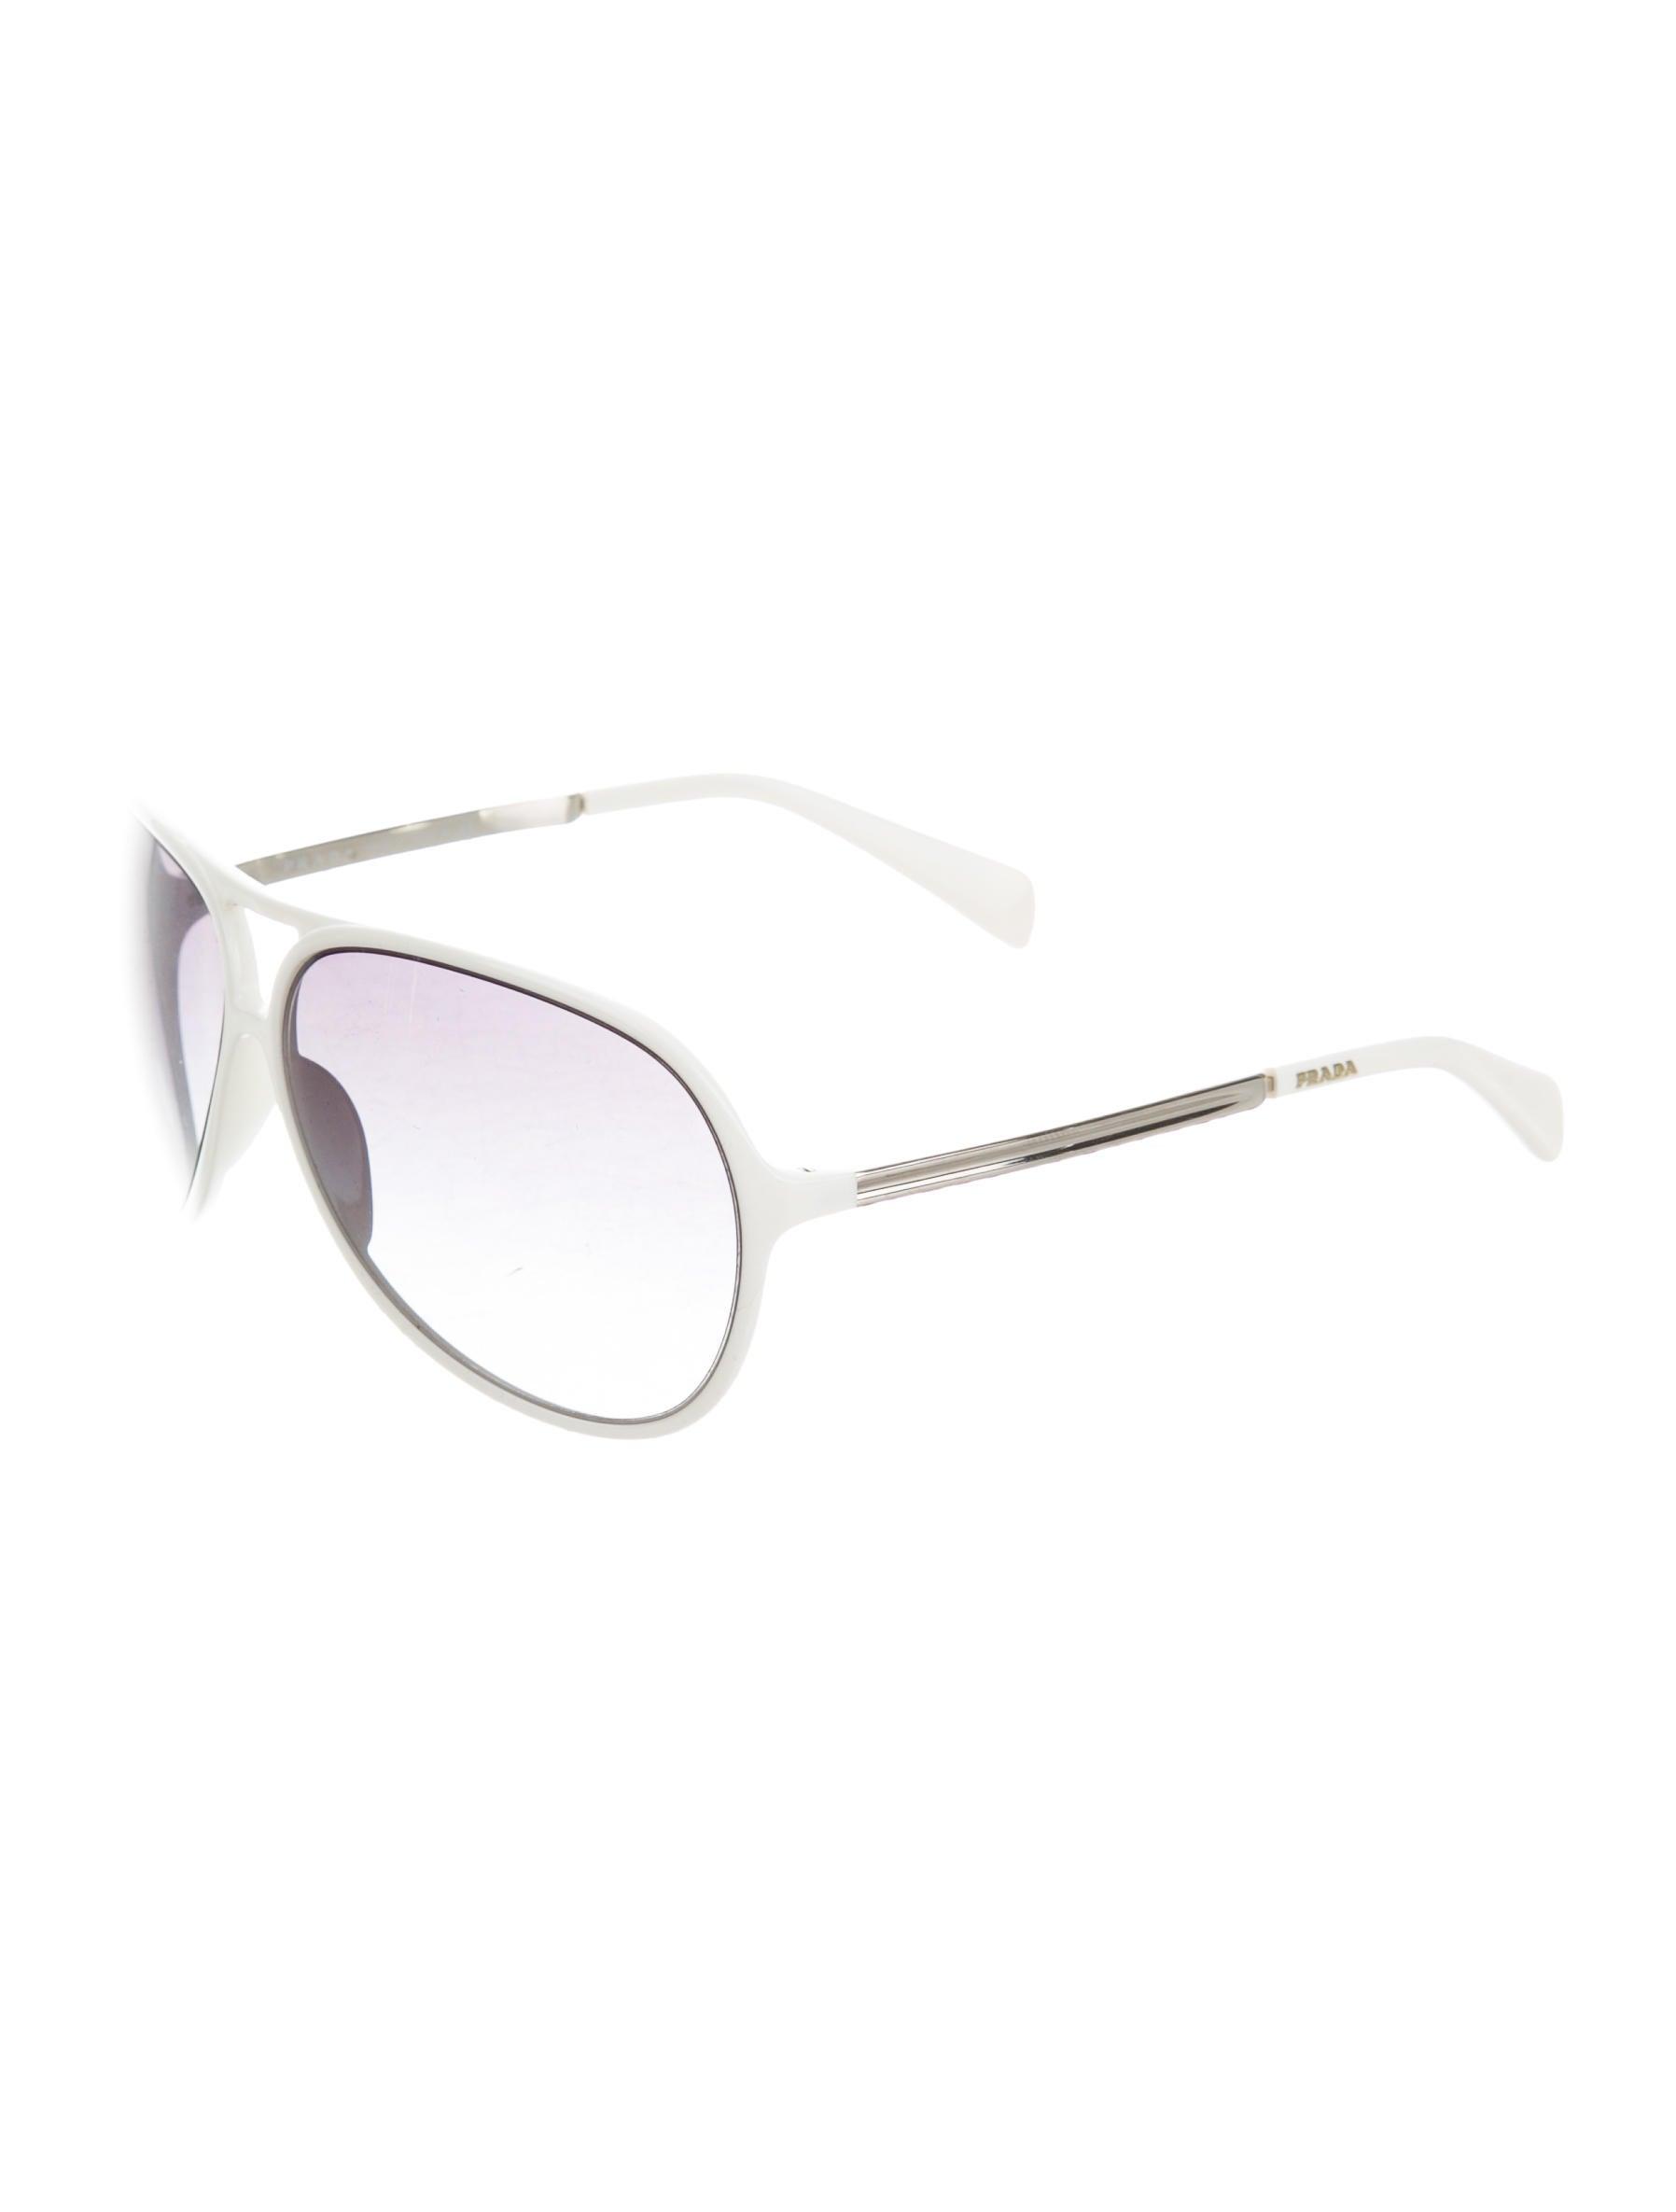 4c00f248d79b Prada Aviator Tinted Sunglasses - Accessories - PRA100152